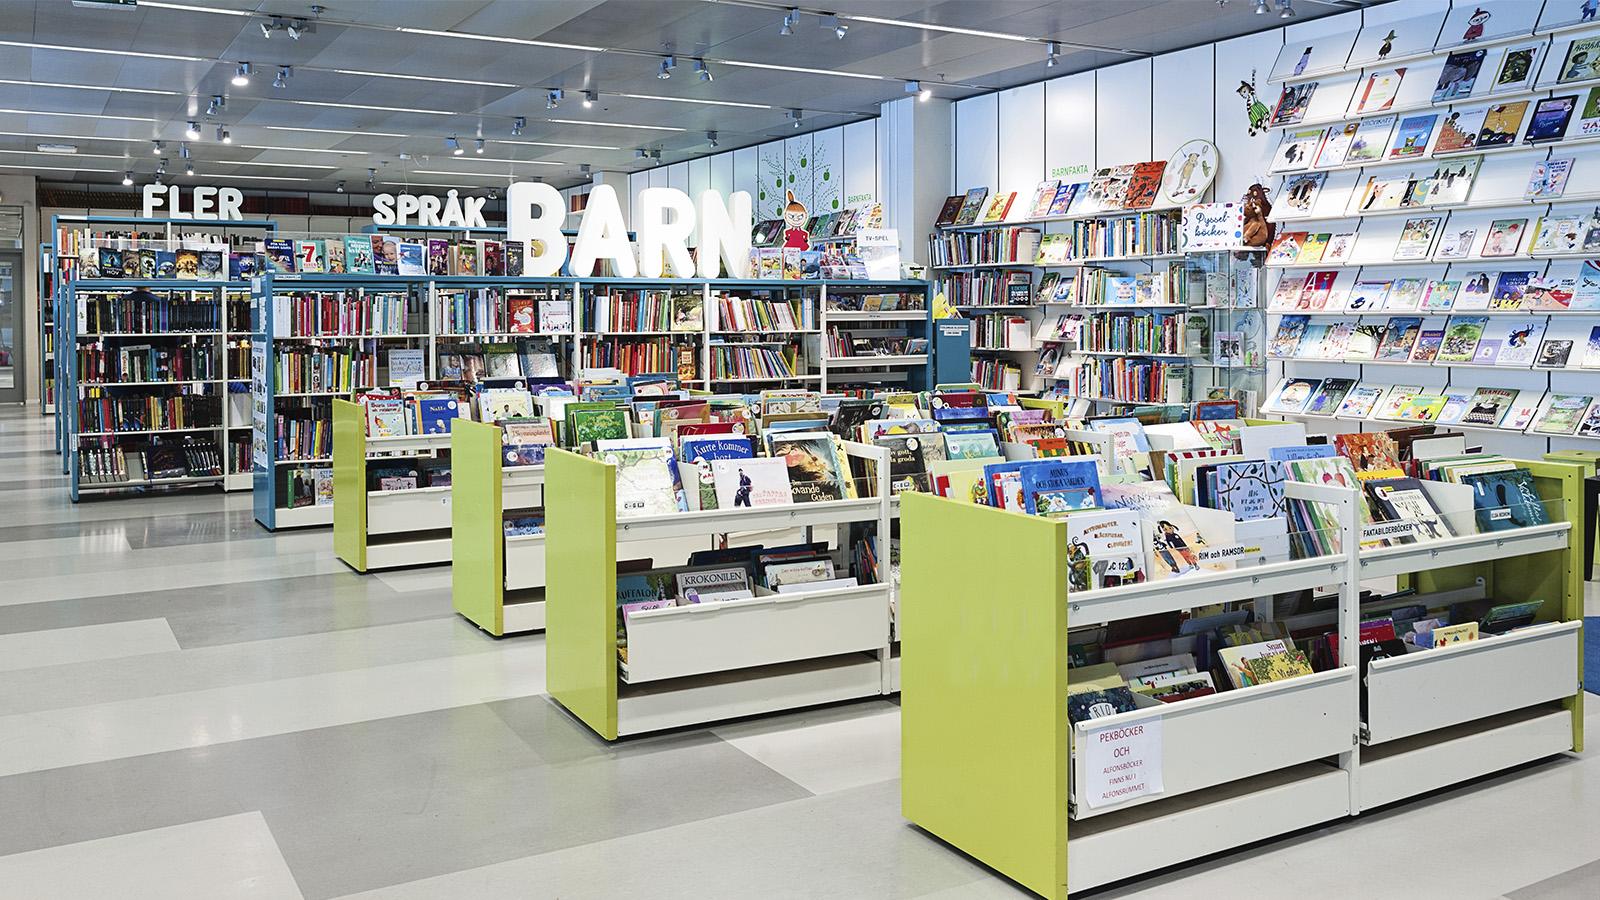 Library of Forum Nacka, Sweden